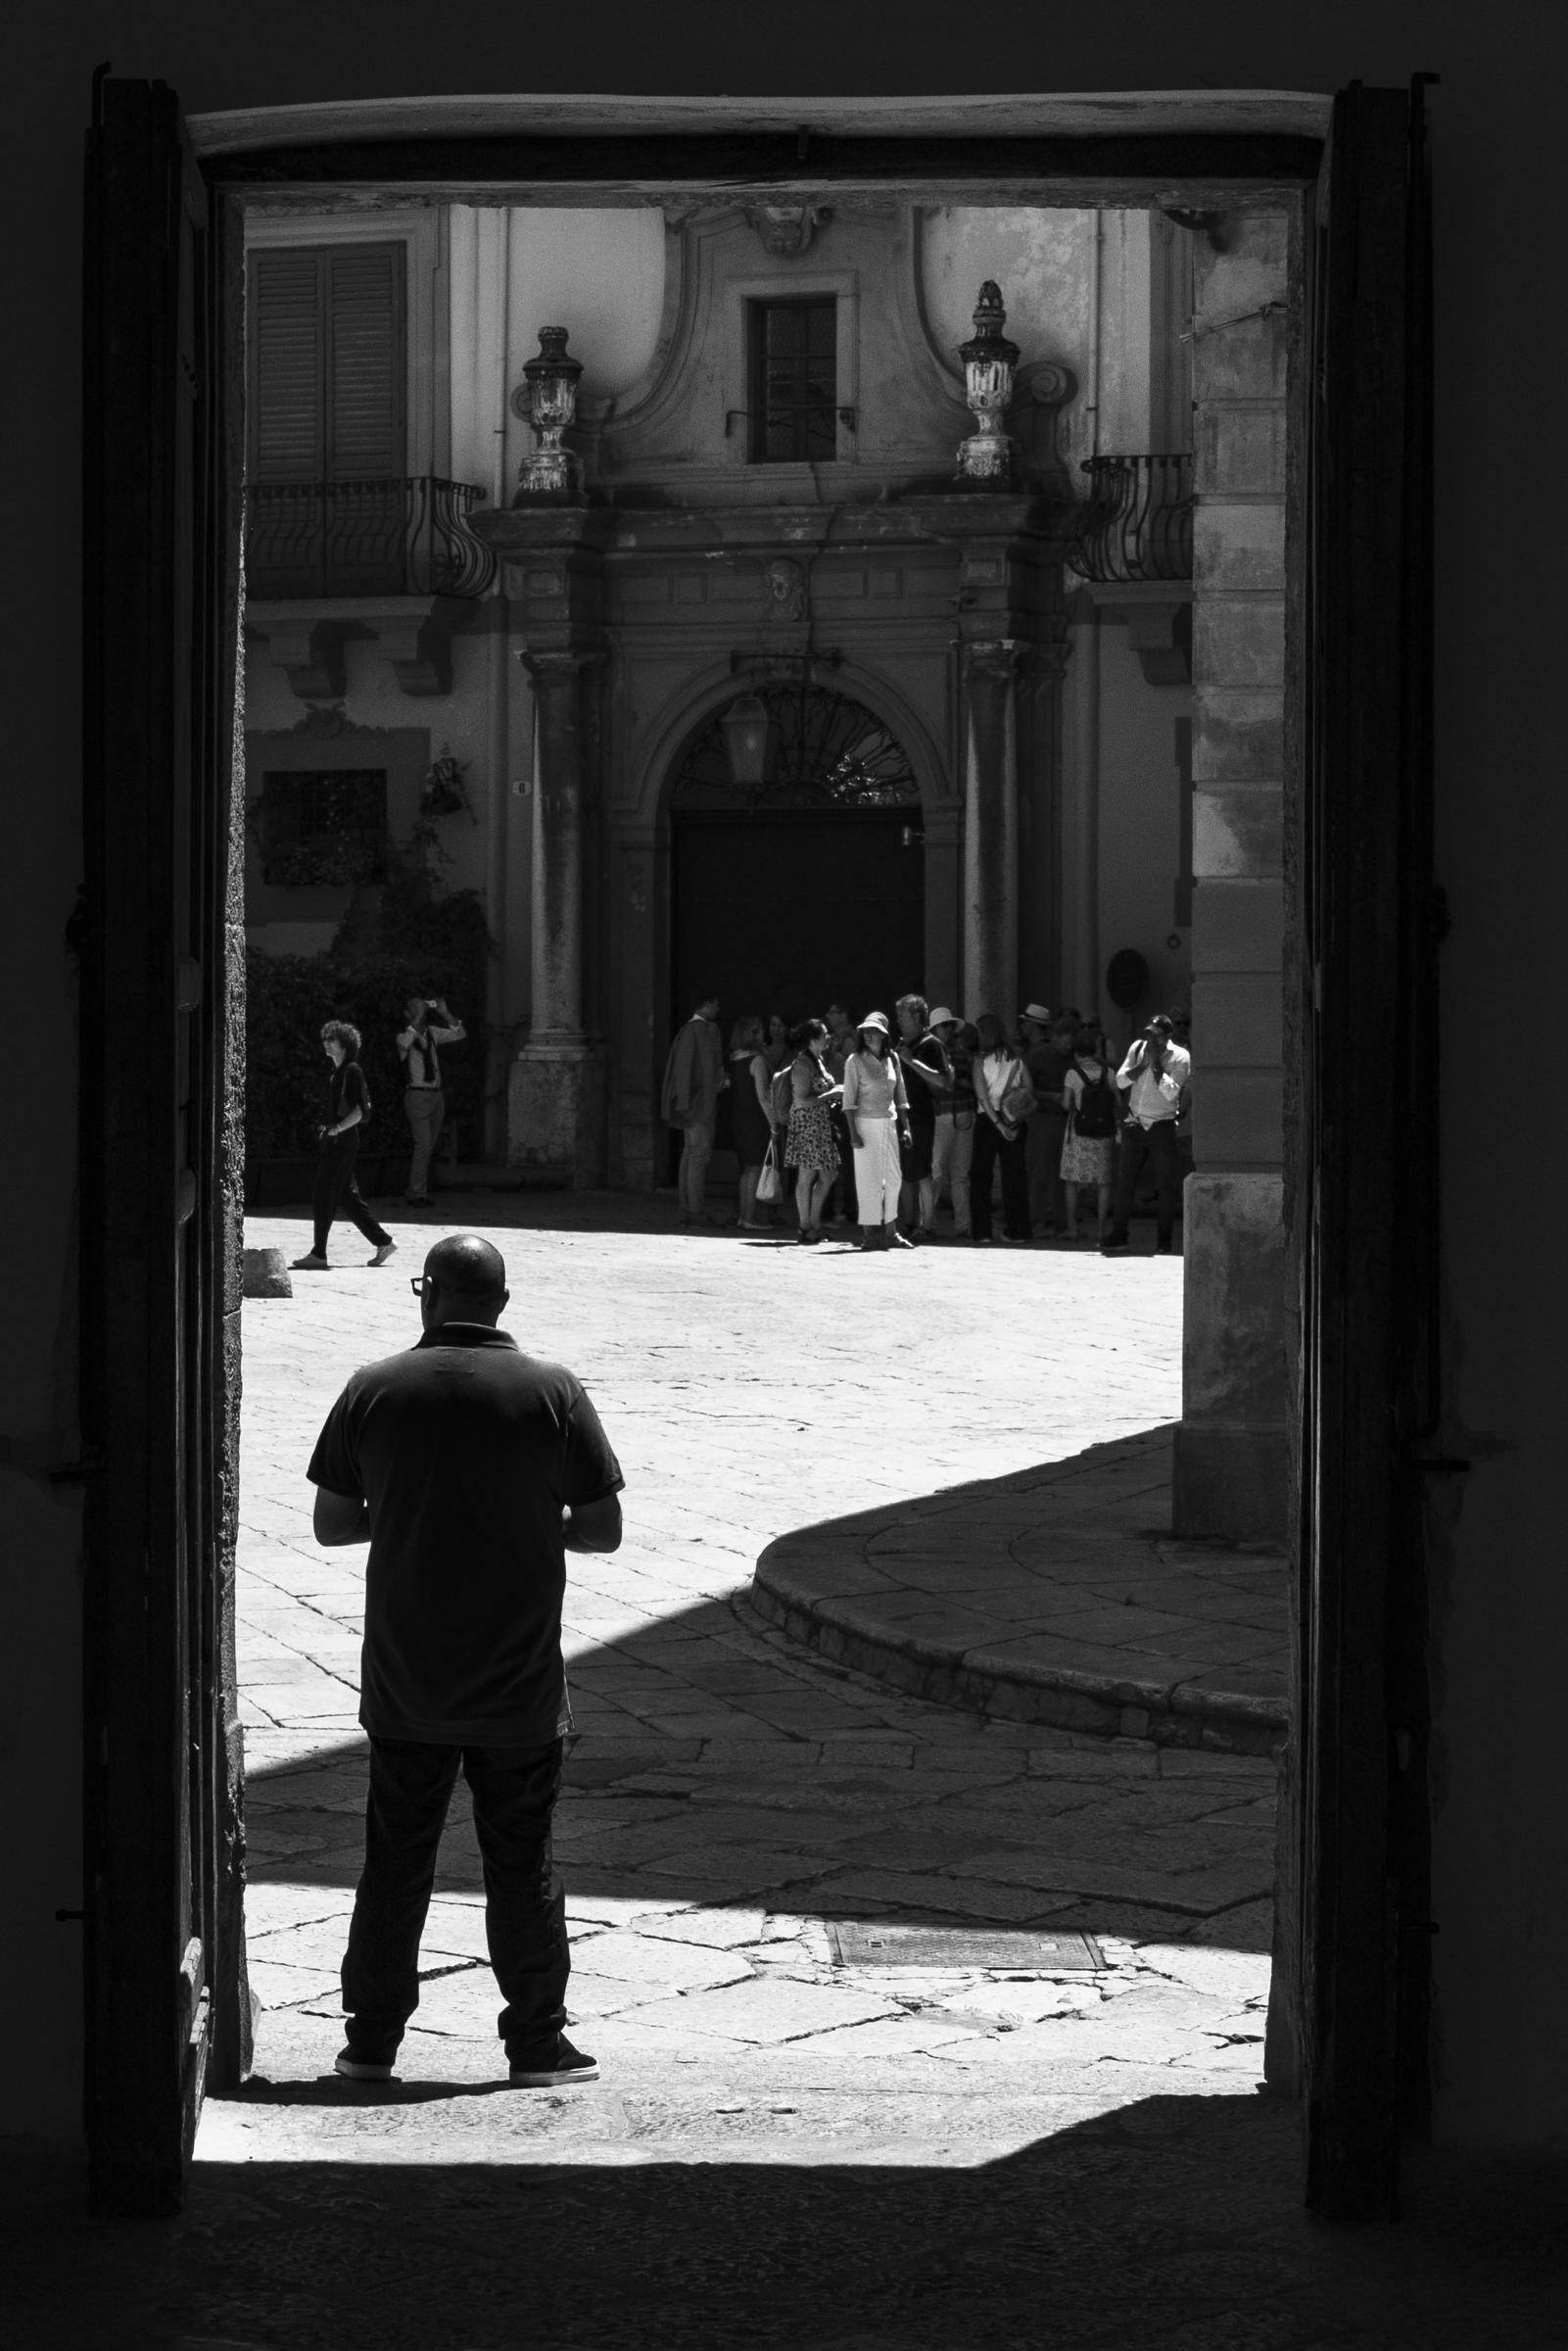 Church entrance, Palermo